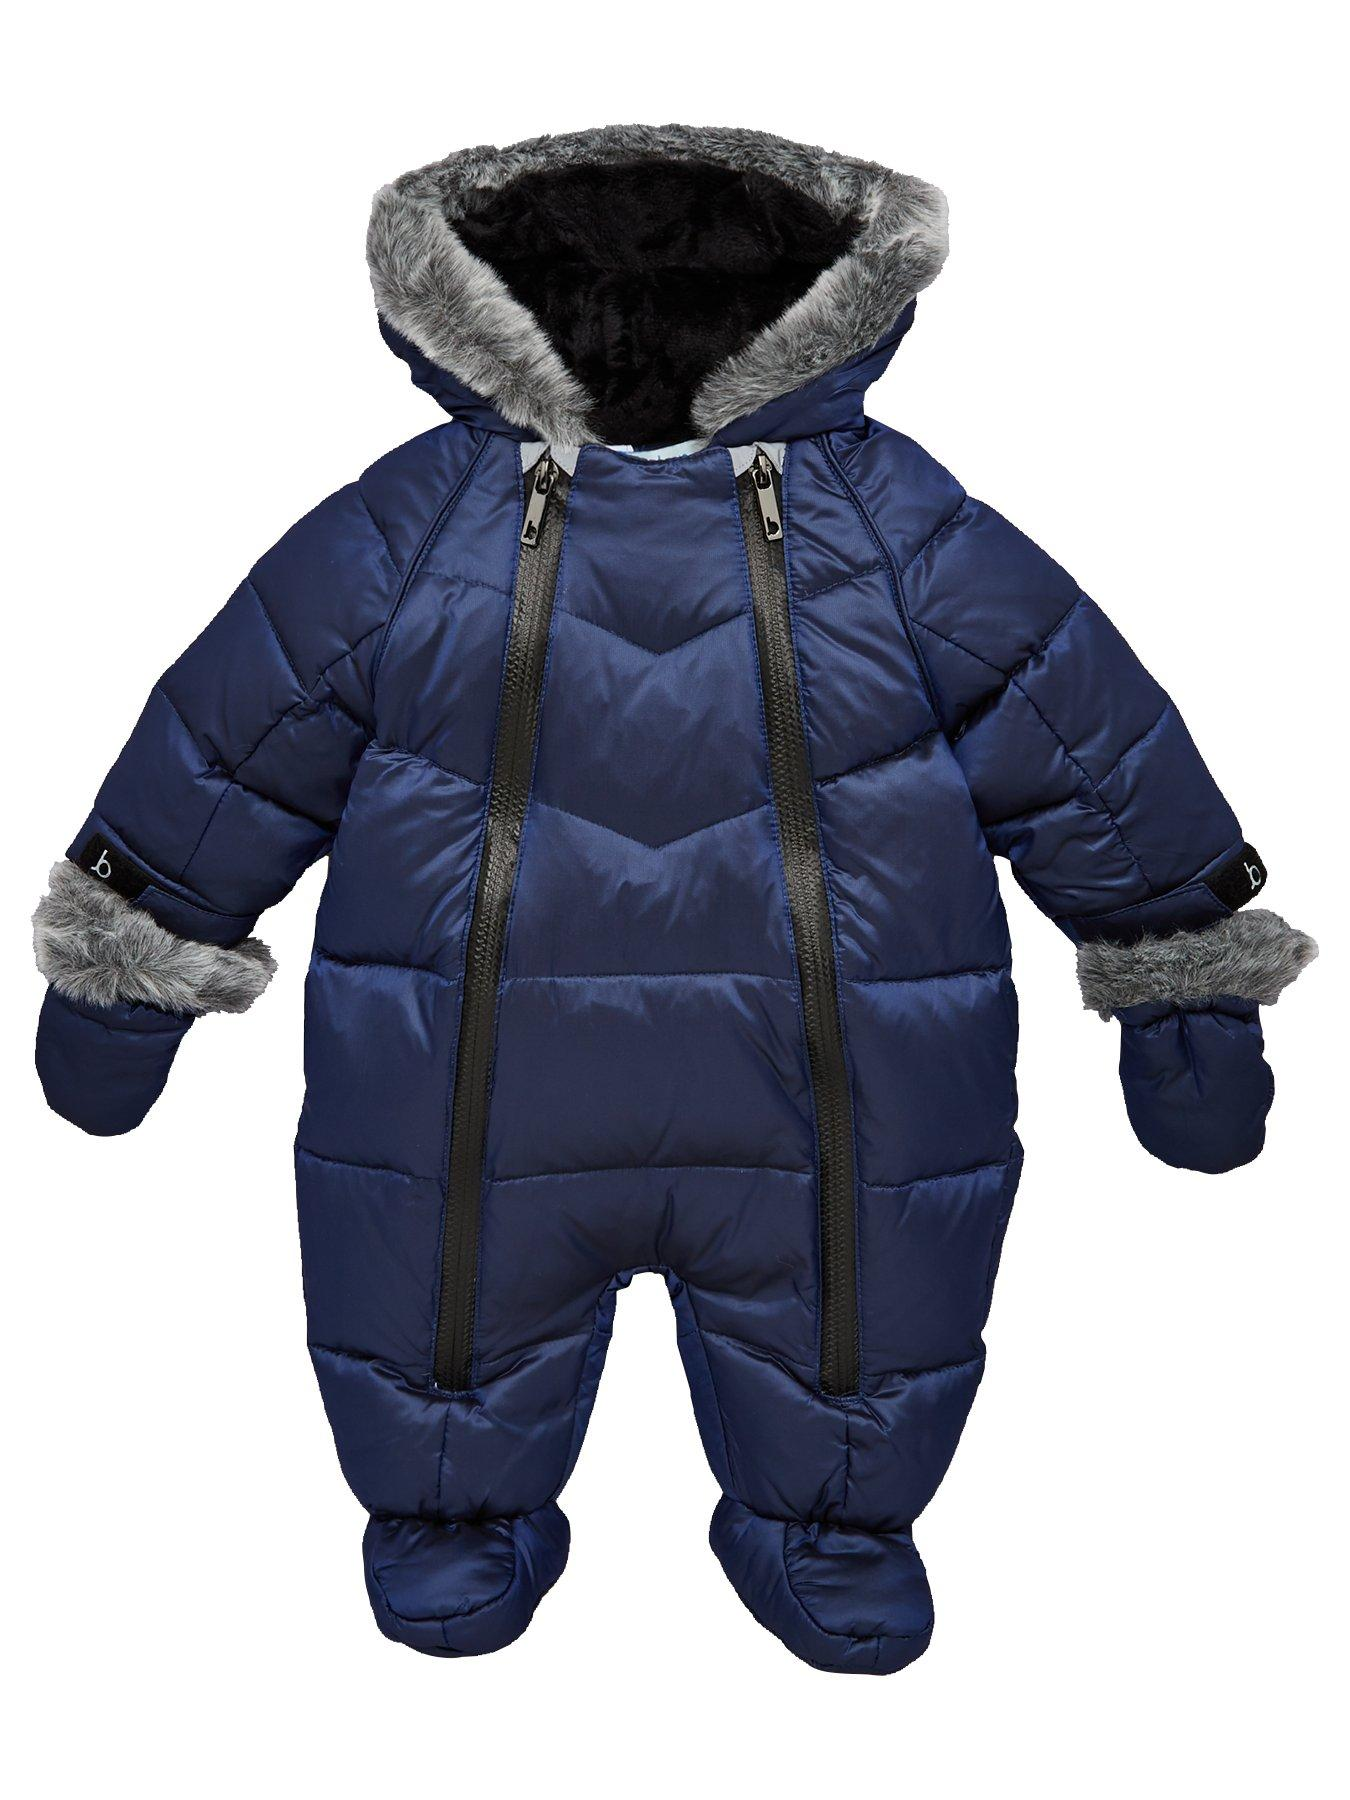 Ted Baker BNWT Baby Boys Blue Snowsuit Pramsuit Age 3-6 Months RRP £55